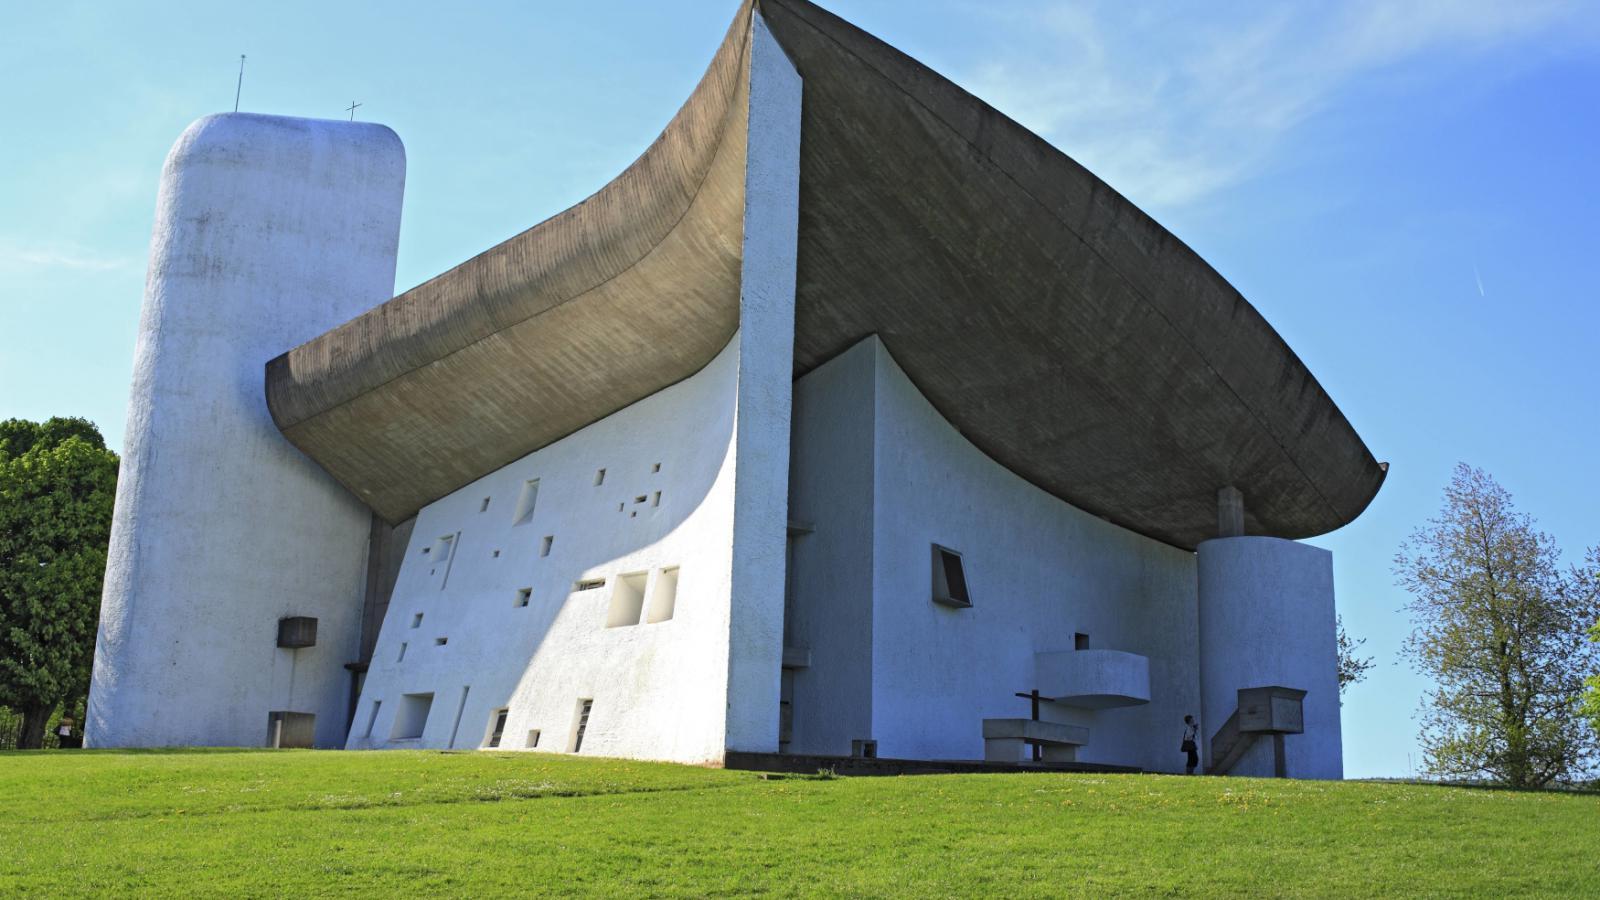 Kaple Notre Dame du Haut v obci Ronchamp